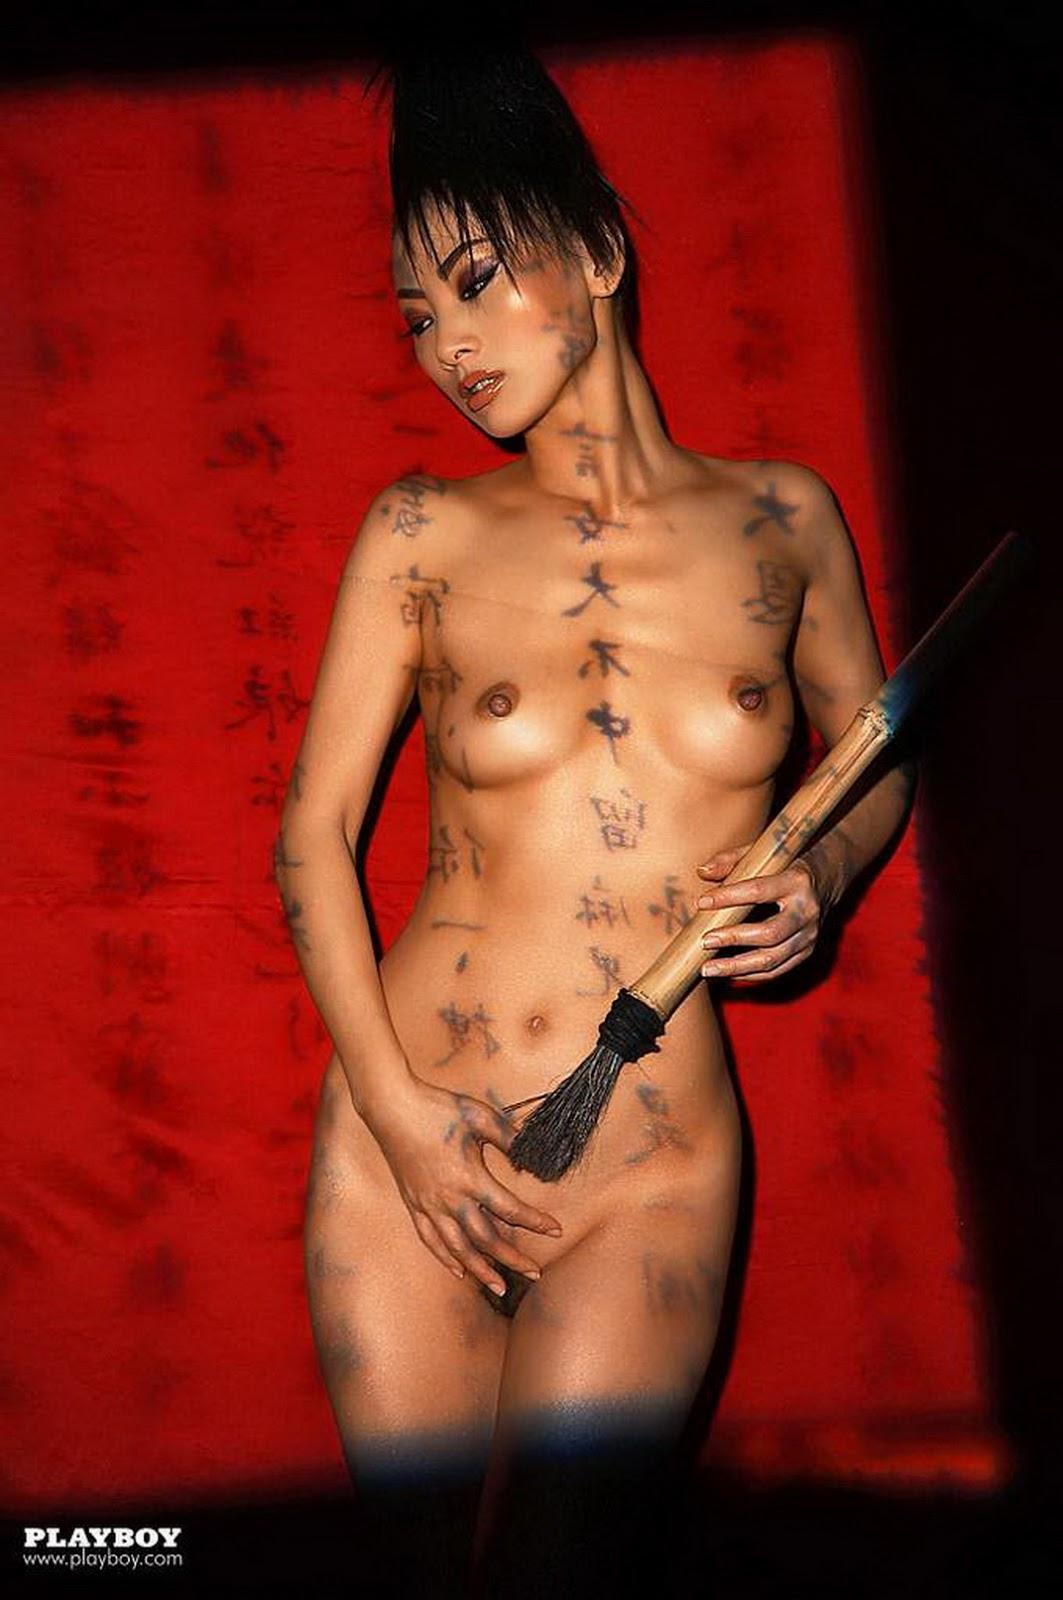 Bai ling nude adult tube